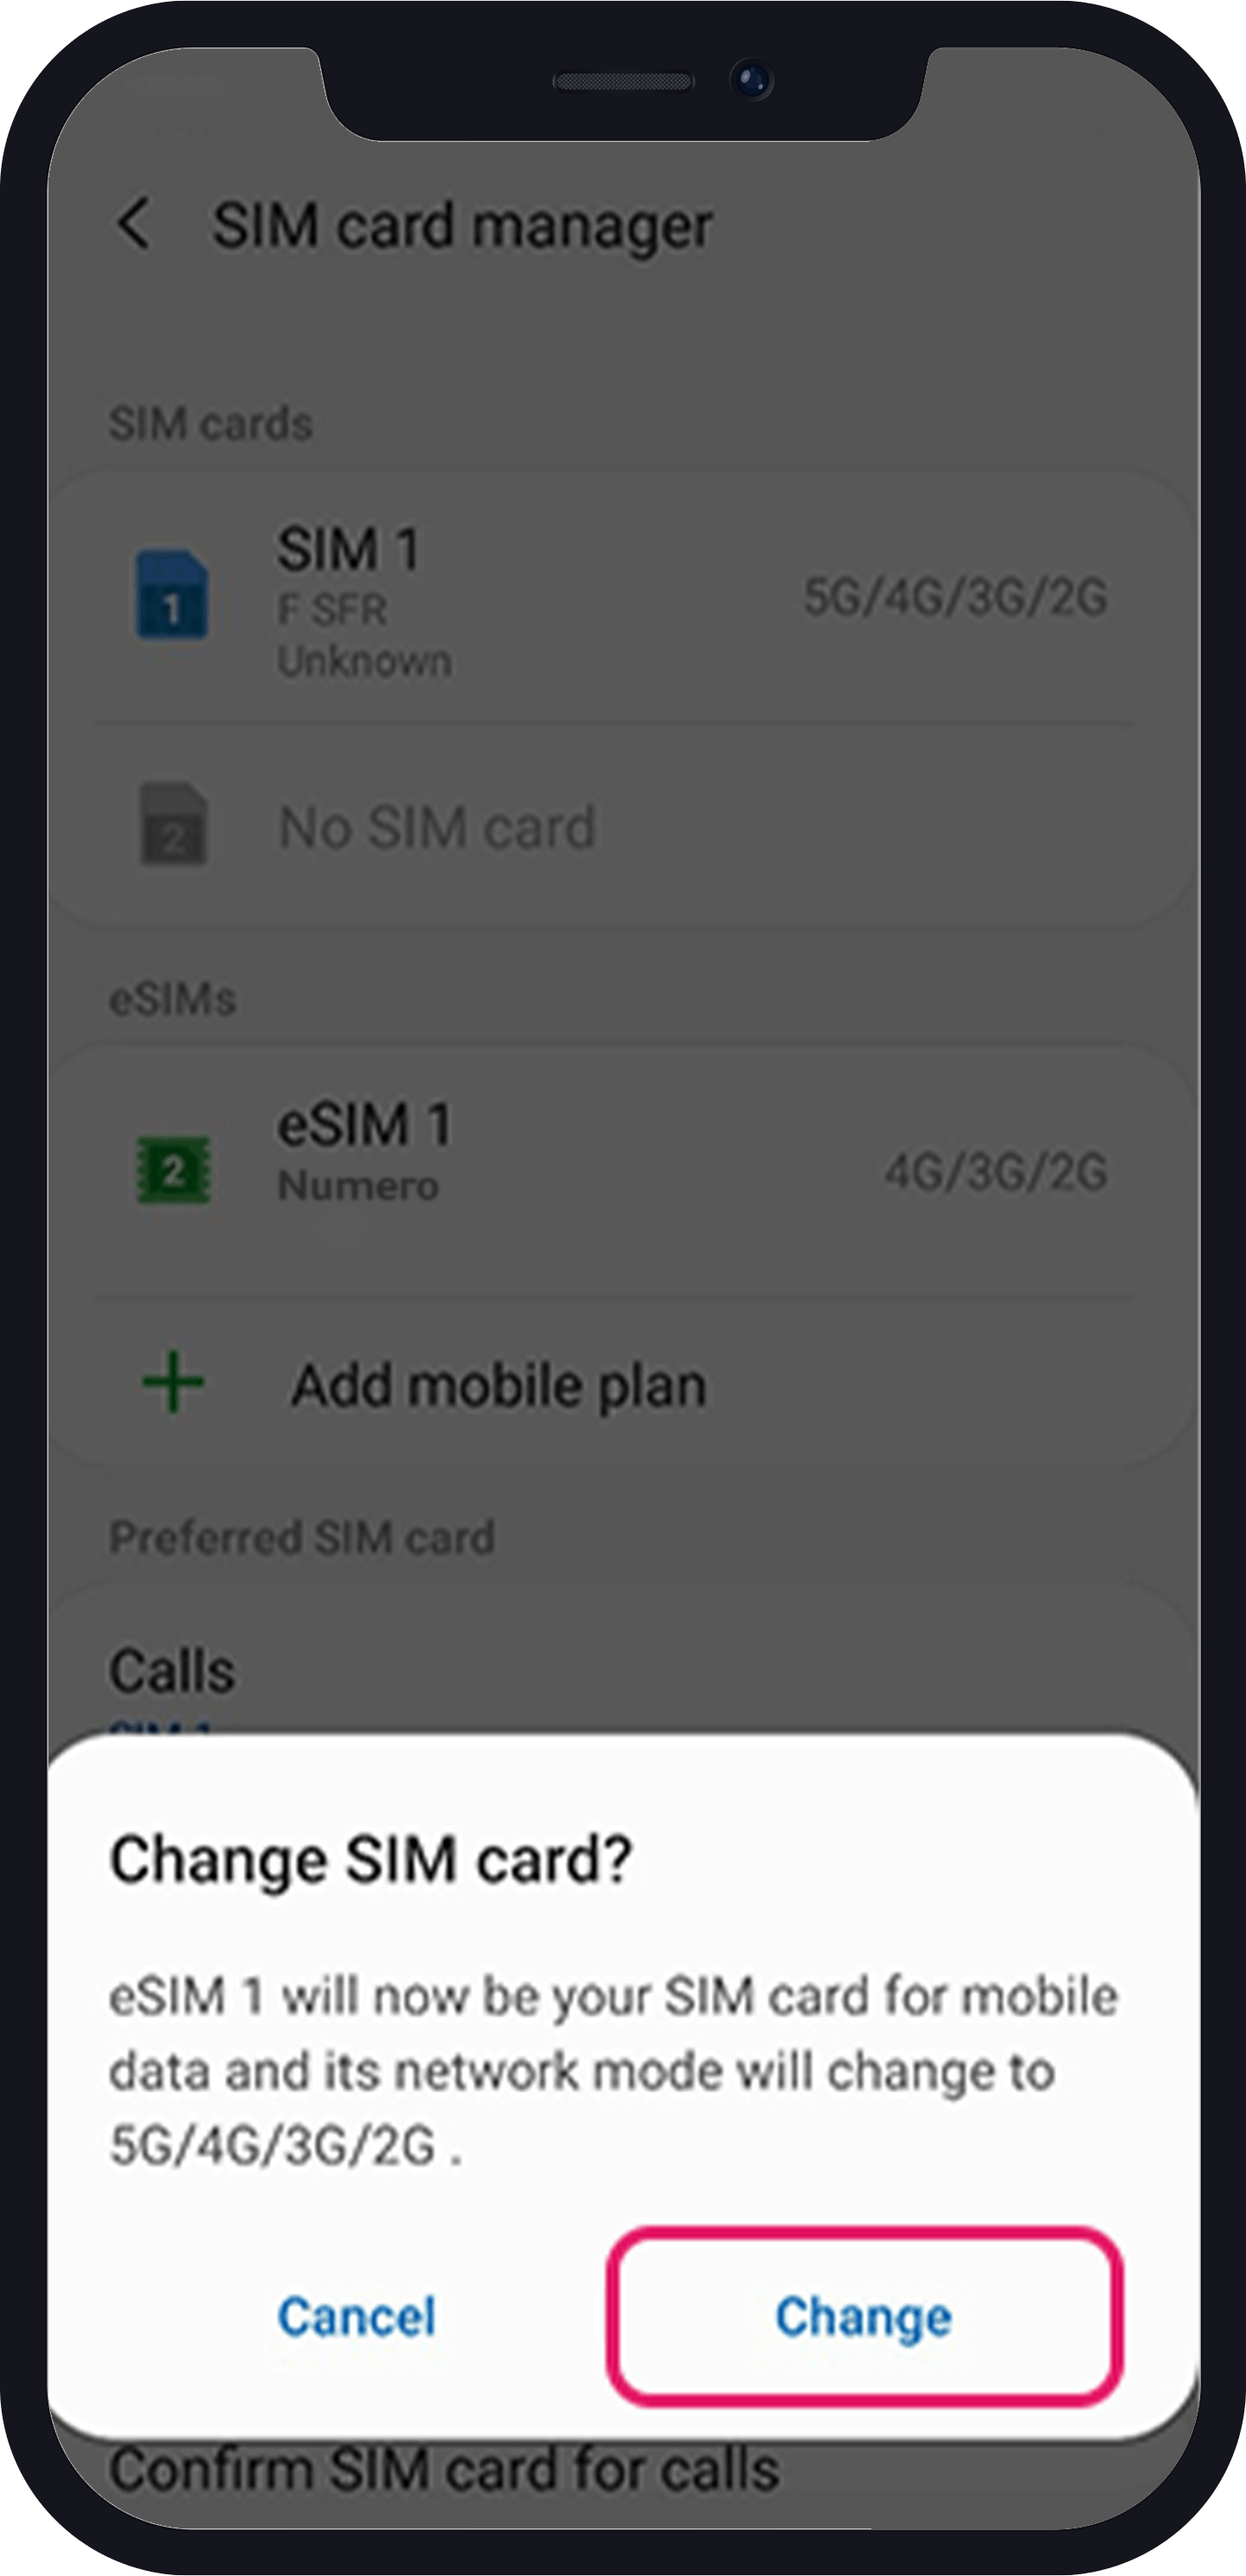 new eSIM sumsung as preferred 2